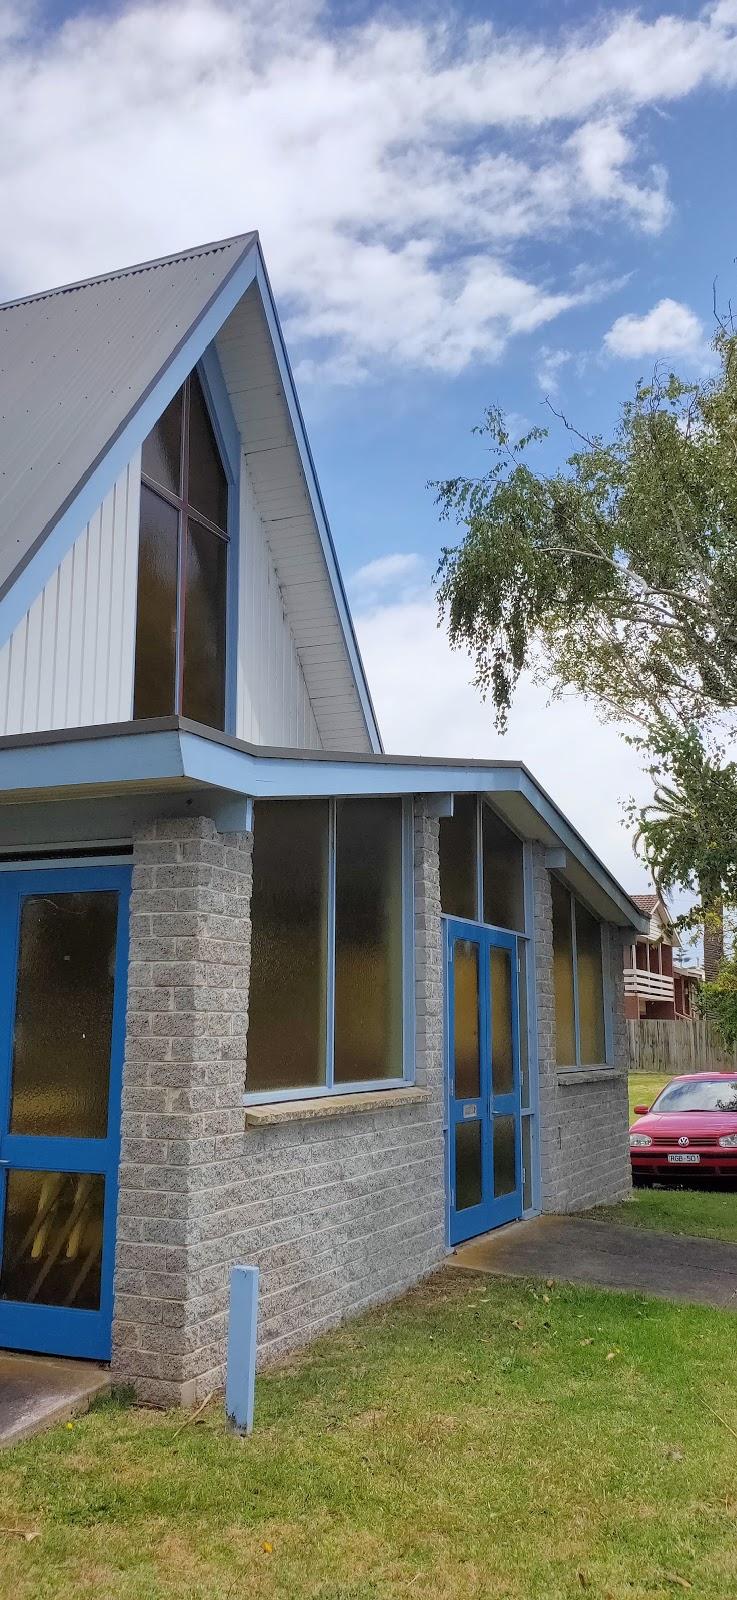 Presbyterian Church Of Rye And Sorento | church | 2 Collingwood St, Rye VIC 3941, Australia